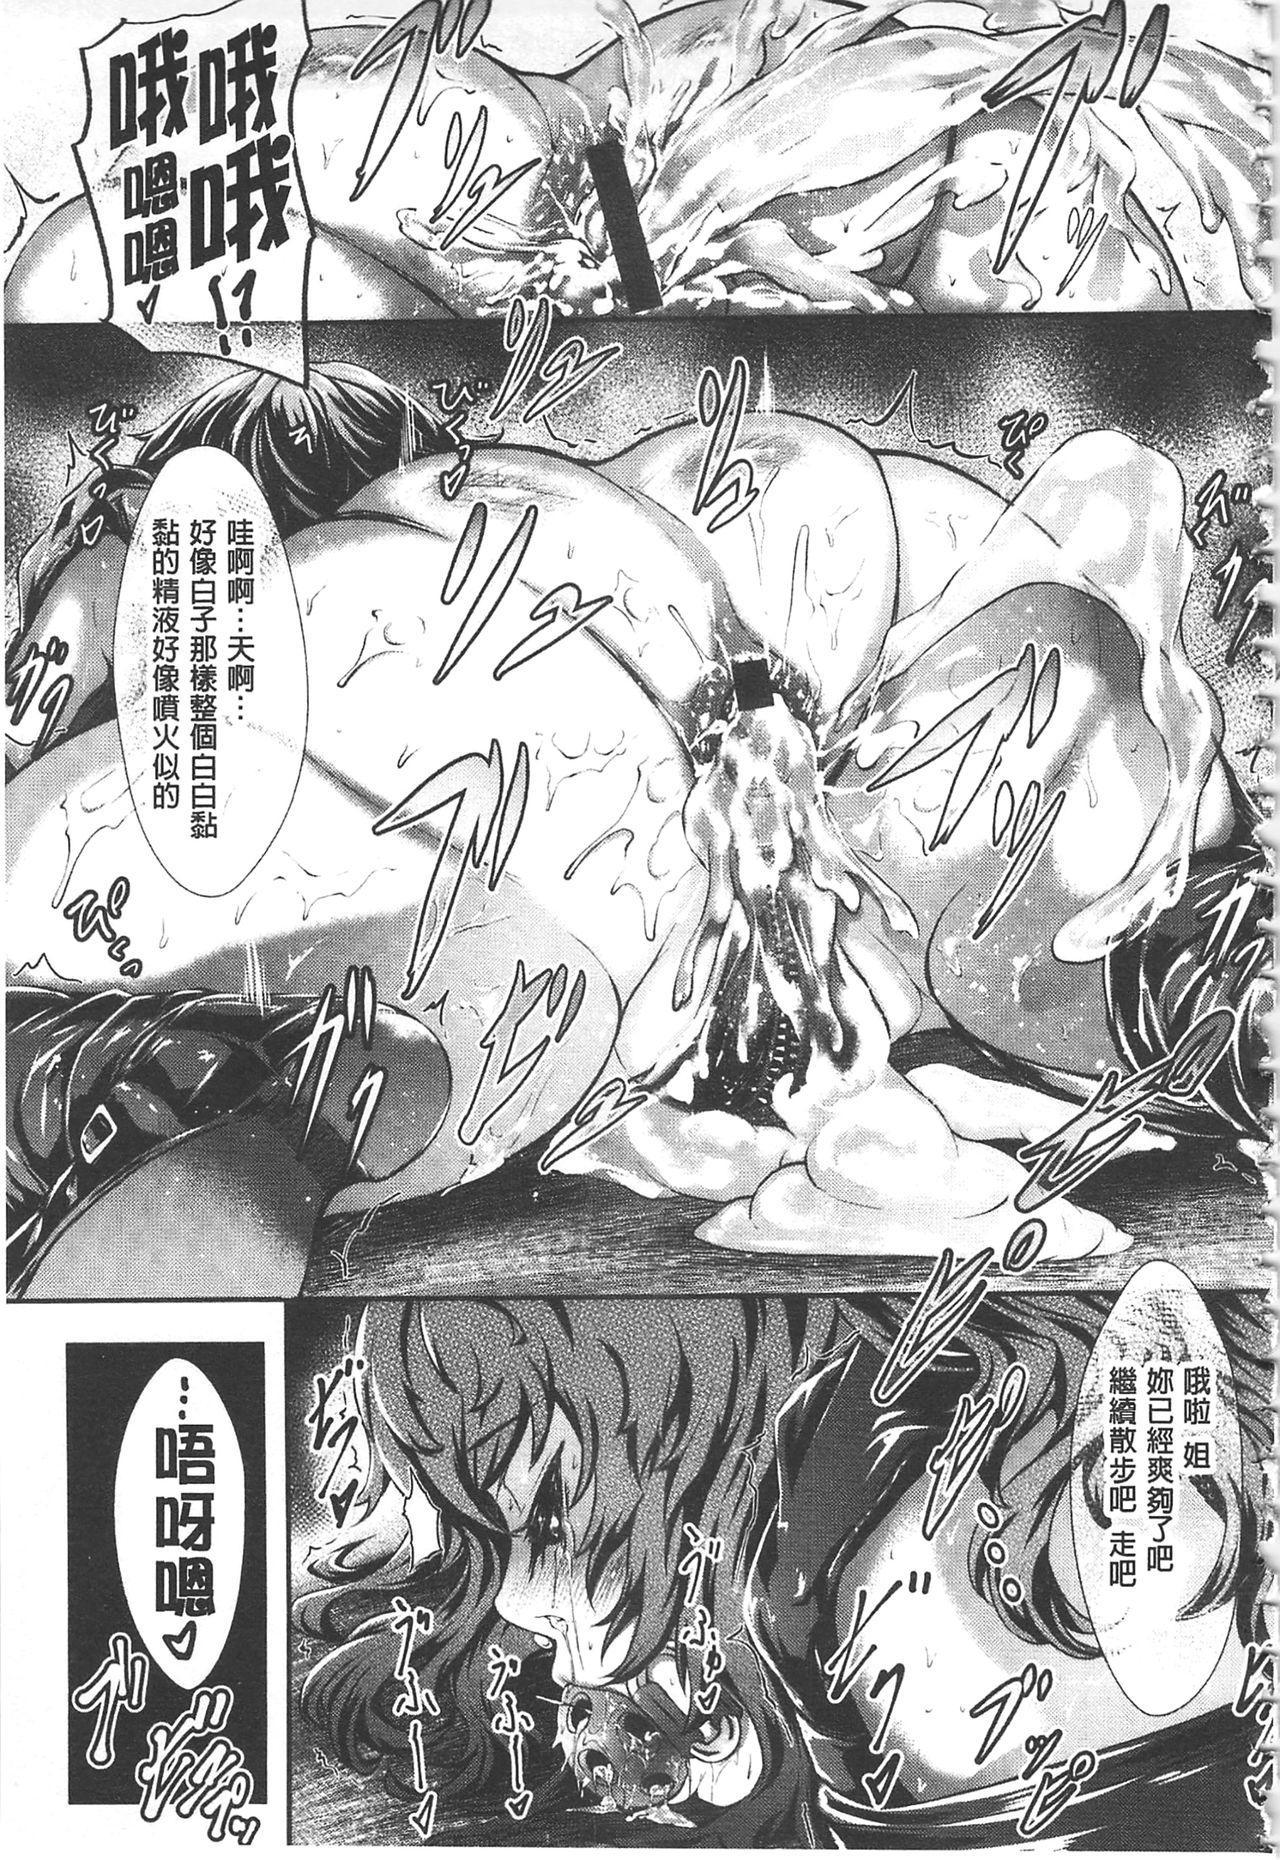 [Lorica] Biinkan Anal ~Kakusei Nejikomi Ana~ | 美淫感猥菊花 塞入擴張覺醒穴 [Chinese] 147